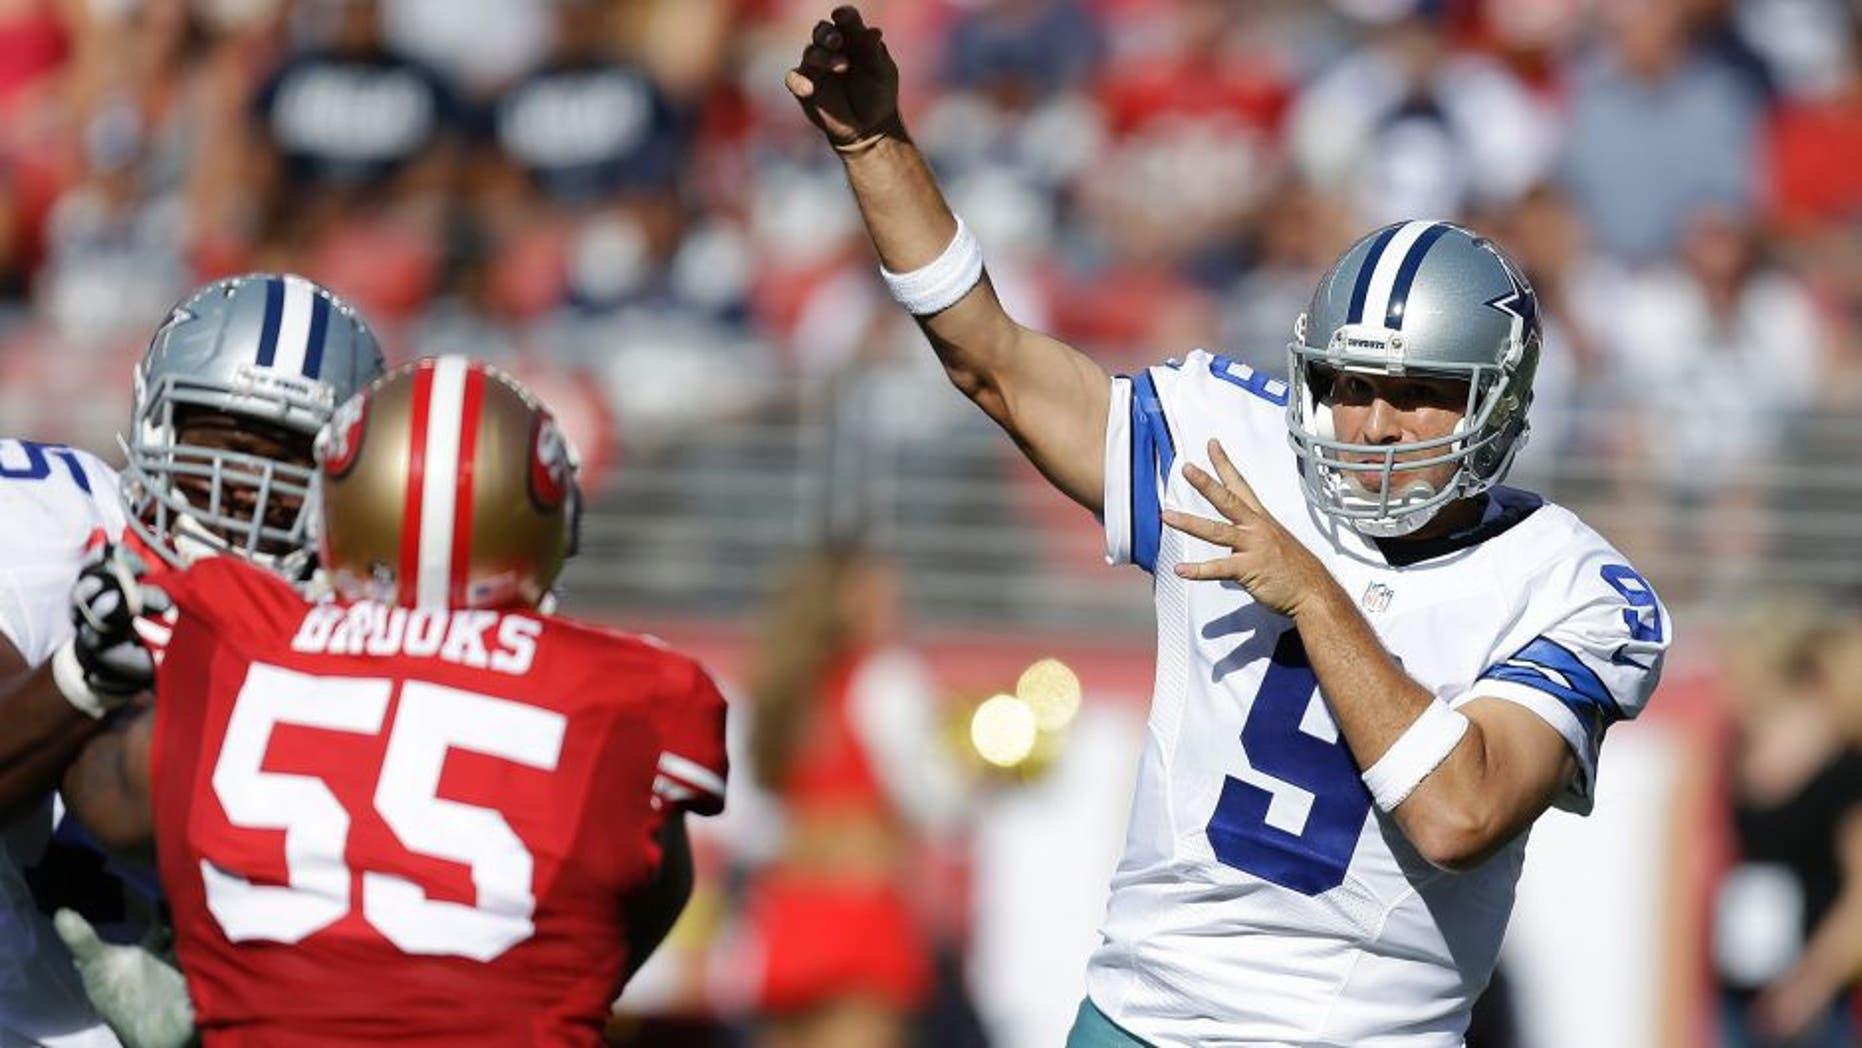 Dallas Cowboys quarterback Tony Romo (9) passes as San Francisco 49ers linebacker Ahmad Brooks (55) applies pressure during the first half of an NFL preseason football game in Santa Clara, Calif., Sunday, Aug. 23, 2015. (AP Photo/Ben Margot)